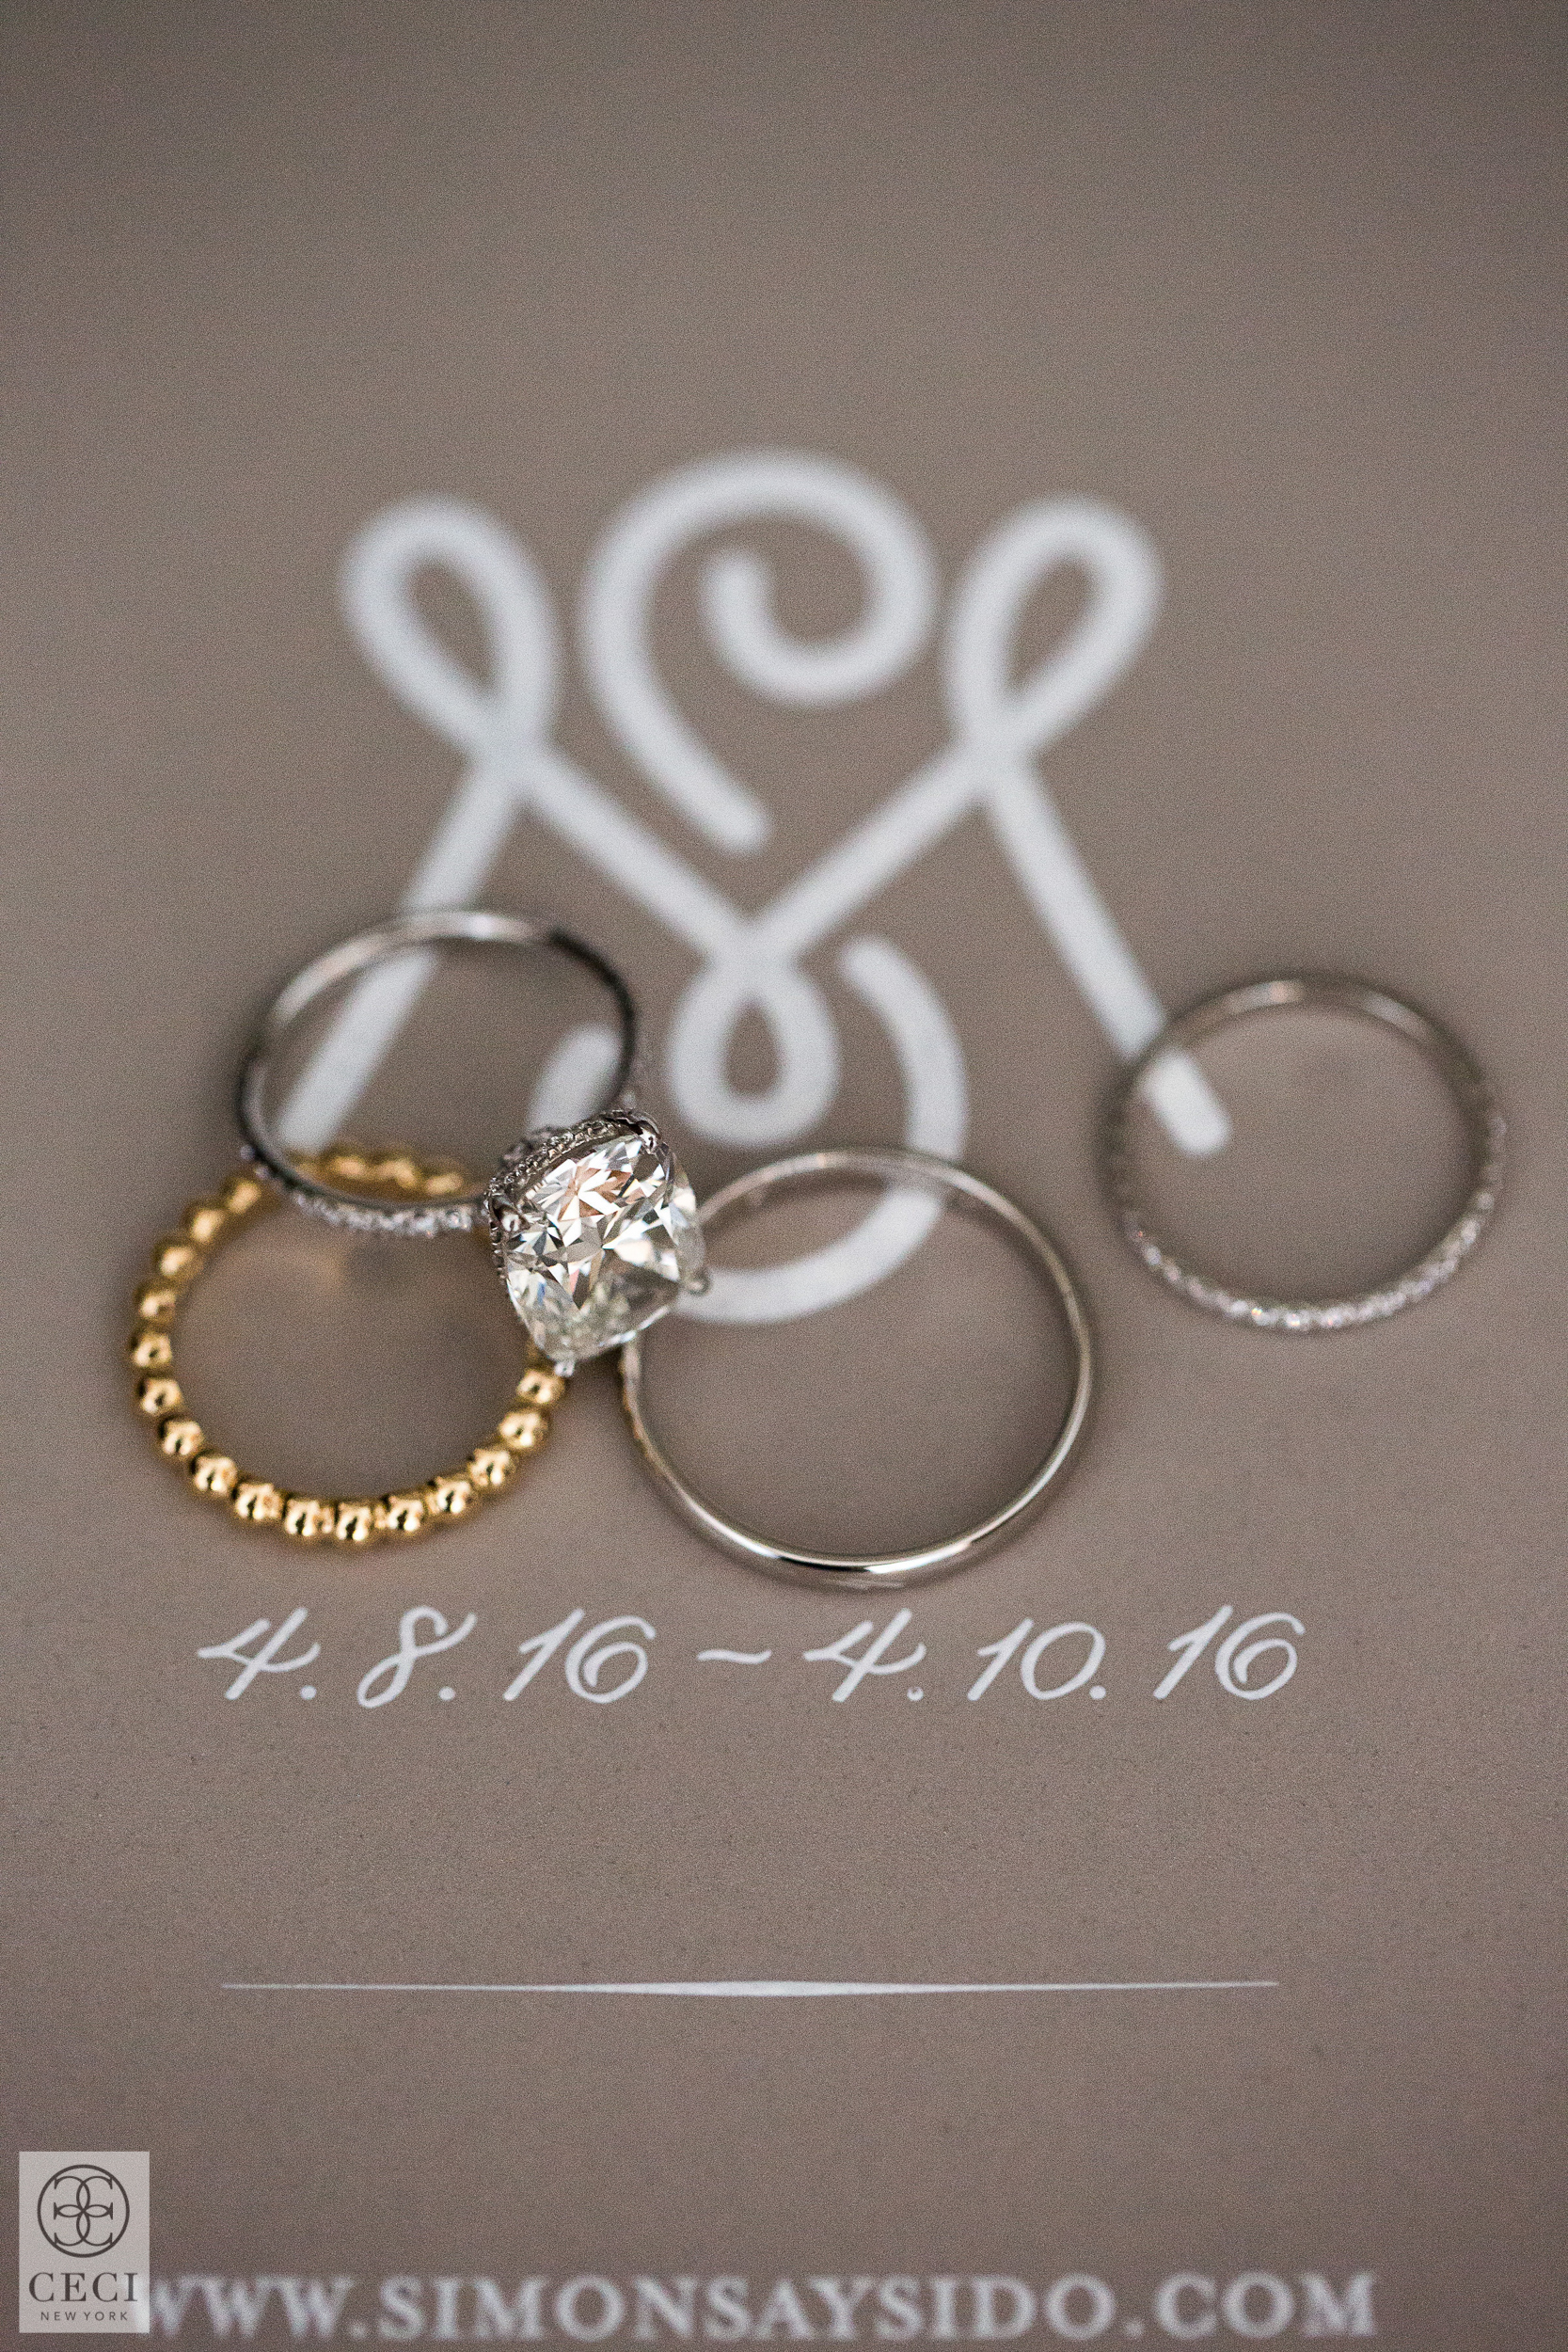 Ceci_New_York_Ceci_Style_Ceci_Johnson_Luxury_Lifestyle_Paradise_Island_Bahamas_Wedding_Engraved_Inspiration_Design_Custom_Couture_Personalized_Invitations_--7.jpg